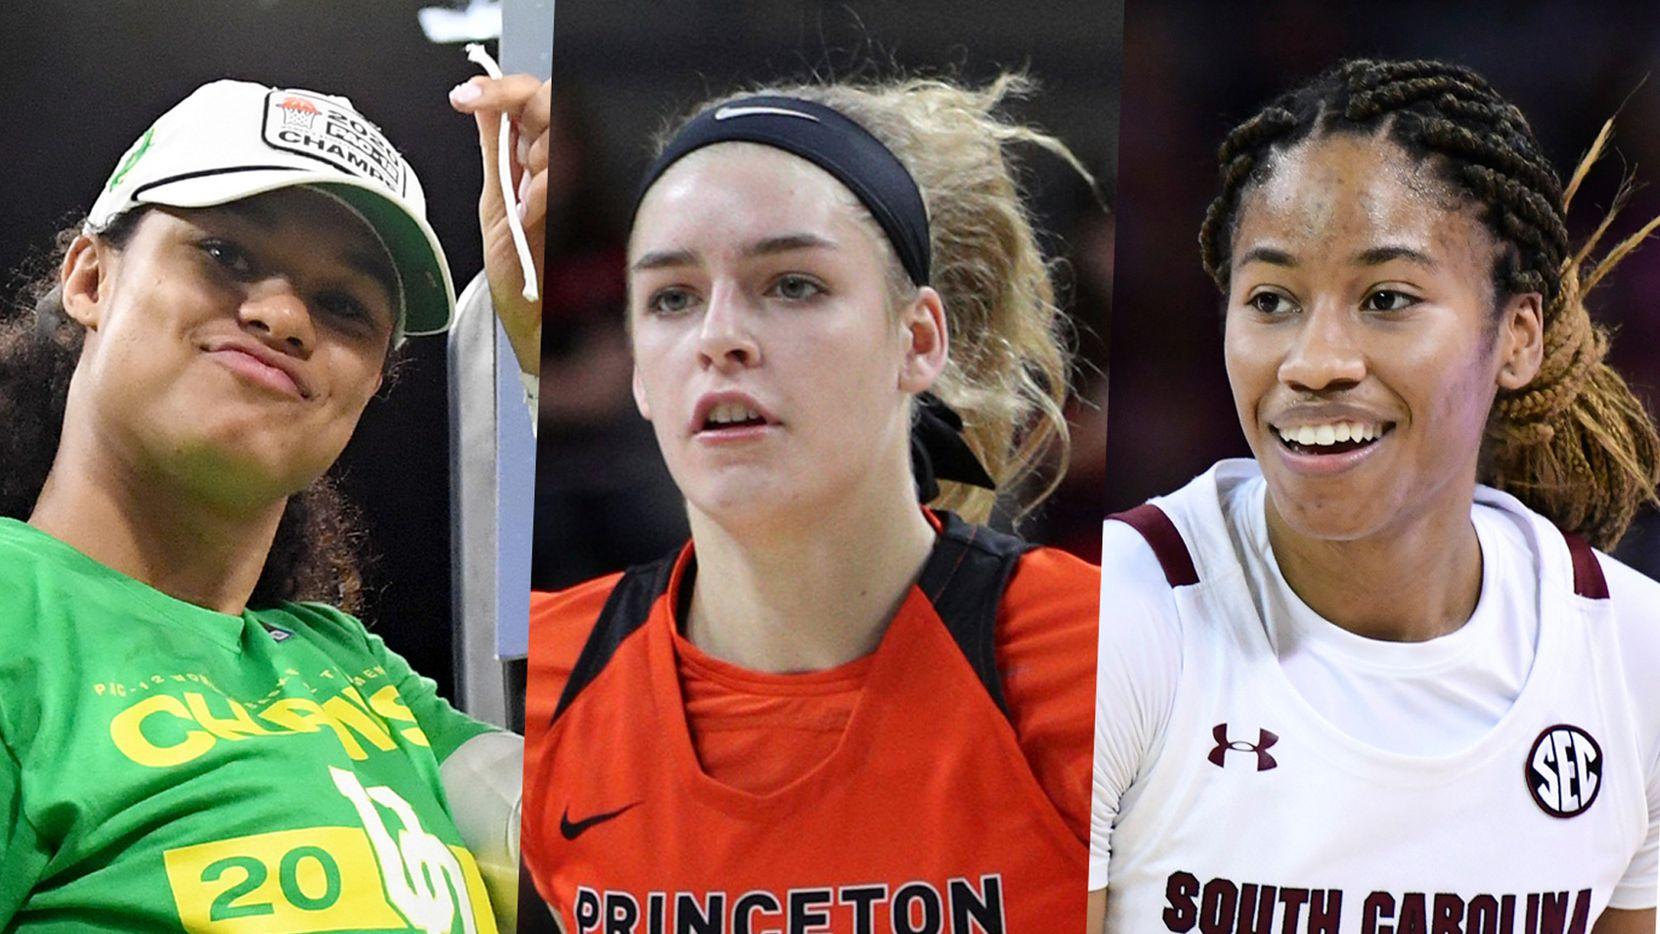 The Dallas Wings had three first-round picks in the 2020 WNBA draft. From left to right: Oregon forward Satou Sabally, Princeton guard/forward Bella Alarie and South Carolina guard Tyasha Harris.